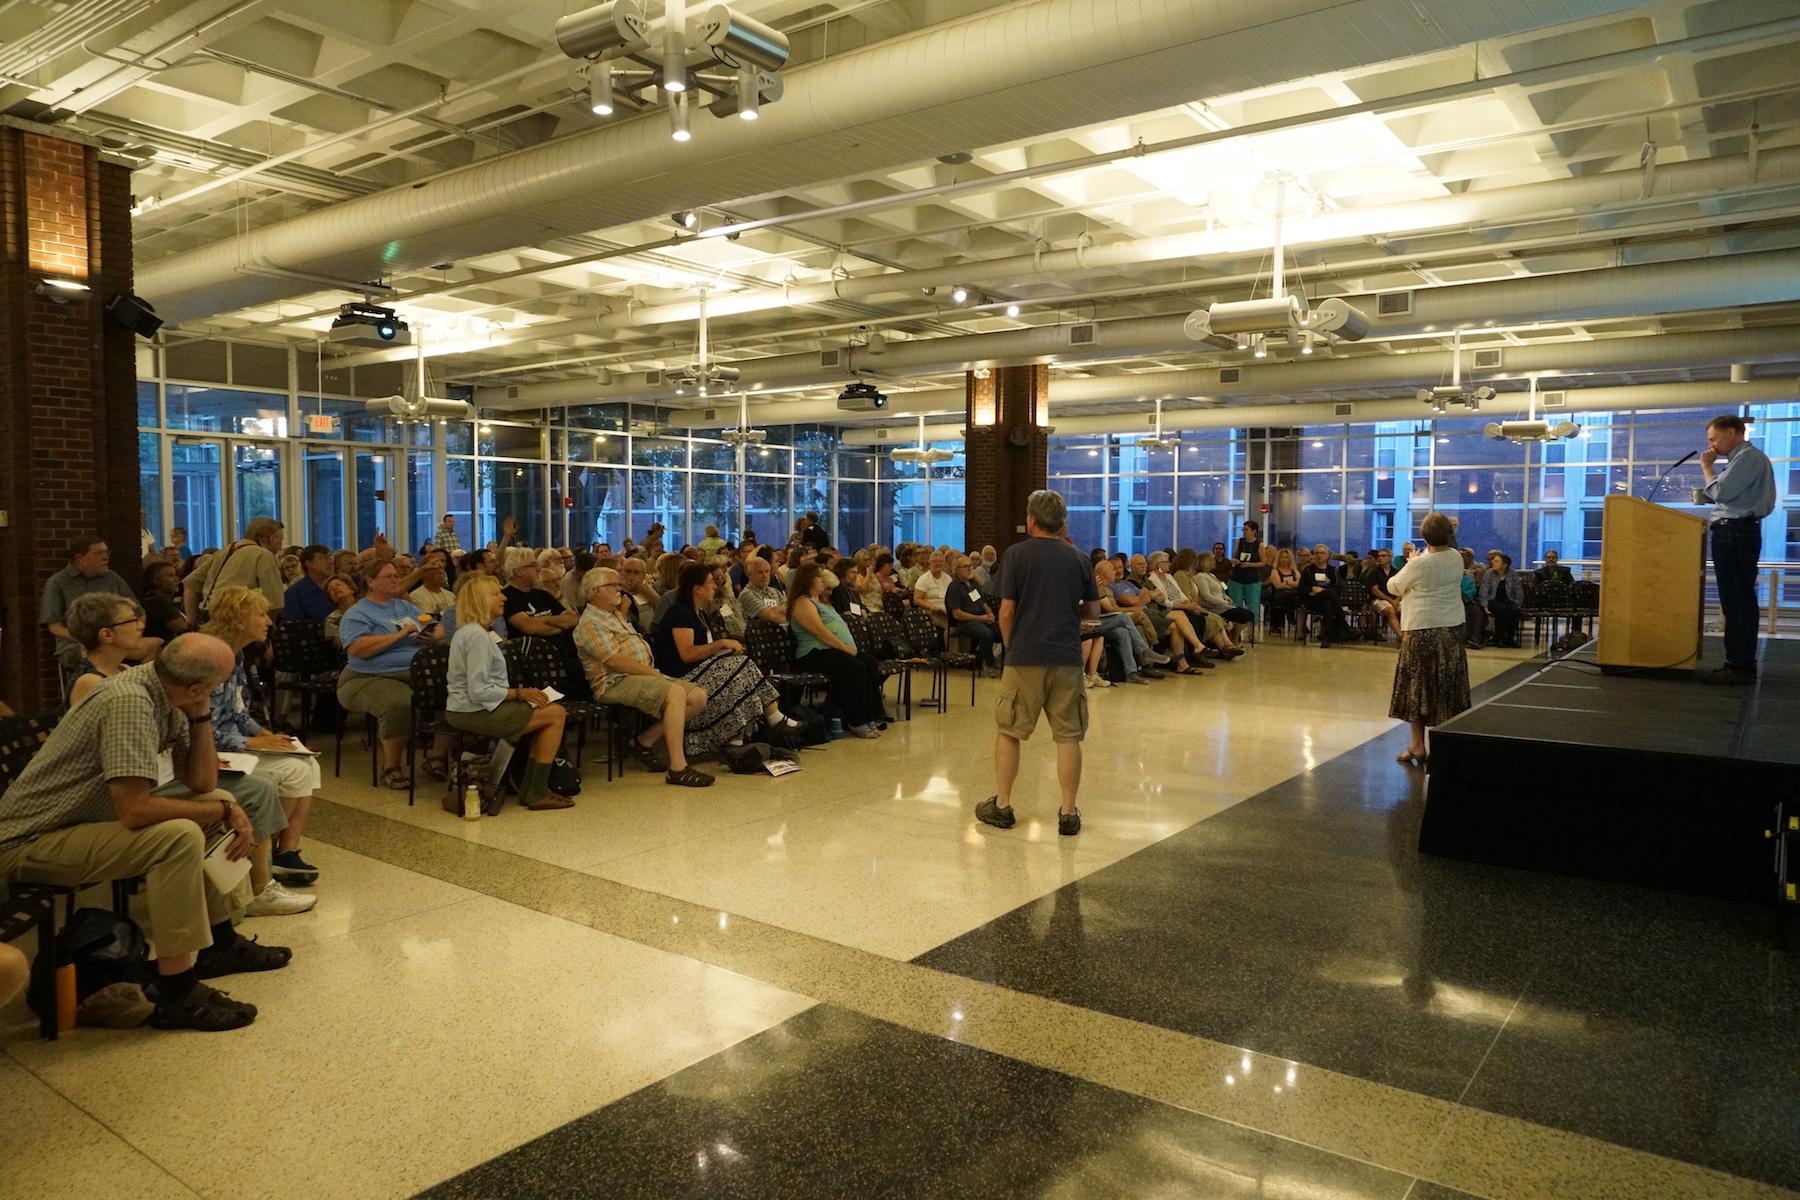 A packed house to hear Post Carbon Institute Senior Fellow Richard Heinberg speak on Friday night. Photo by Teresa Konechne.